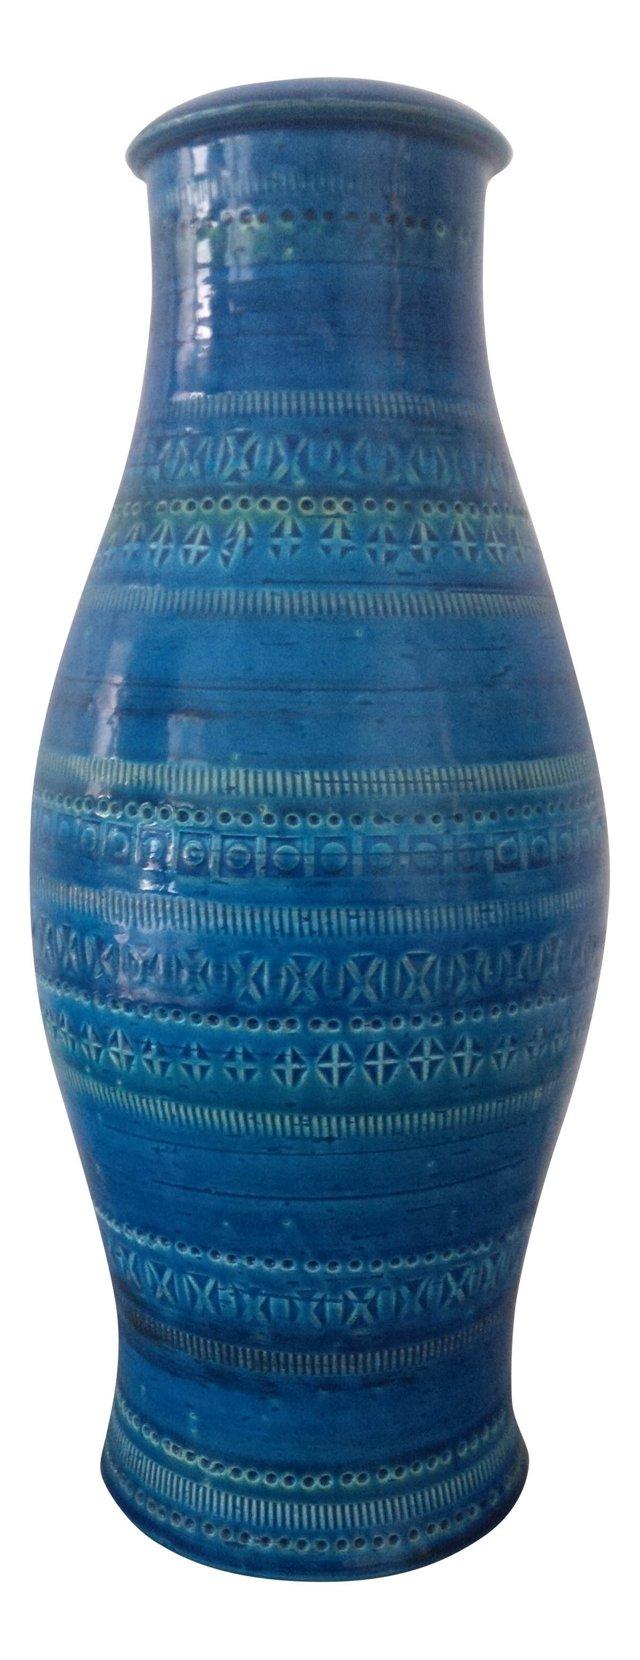 Blue Ceramic Vase by Flavia